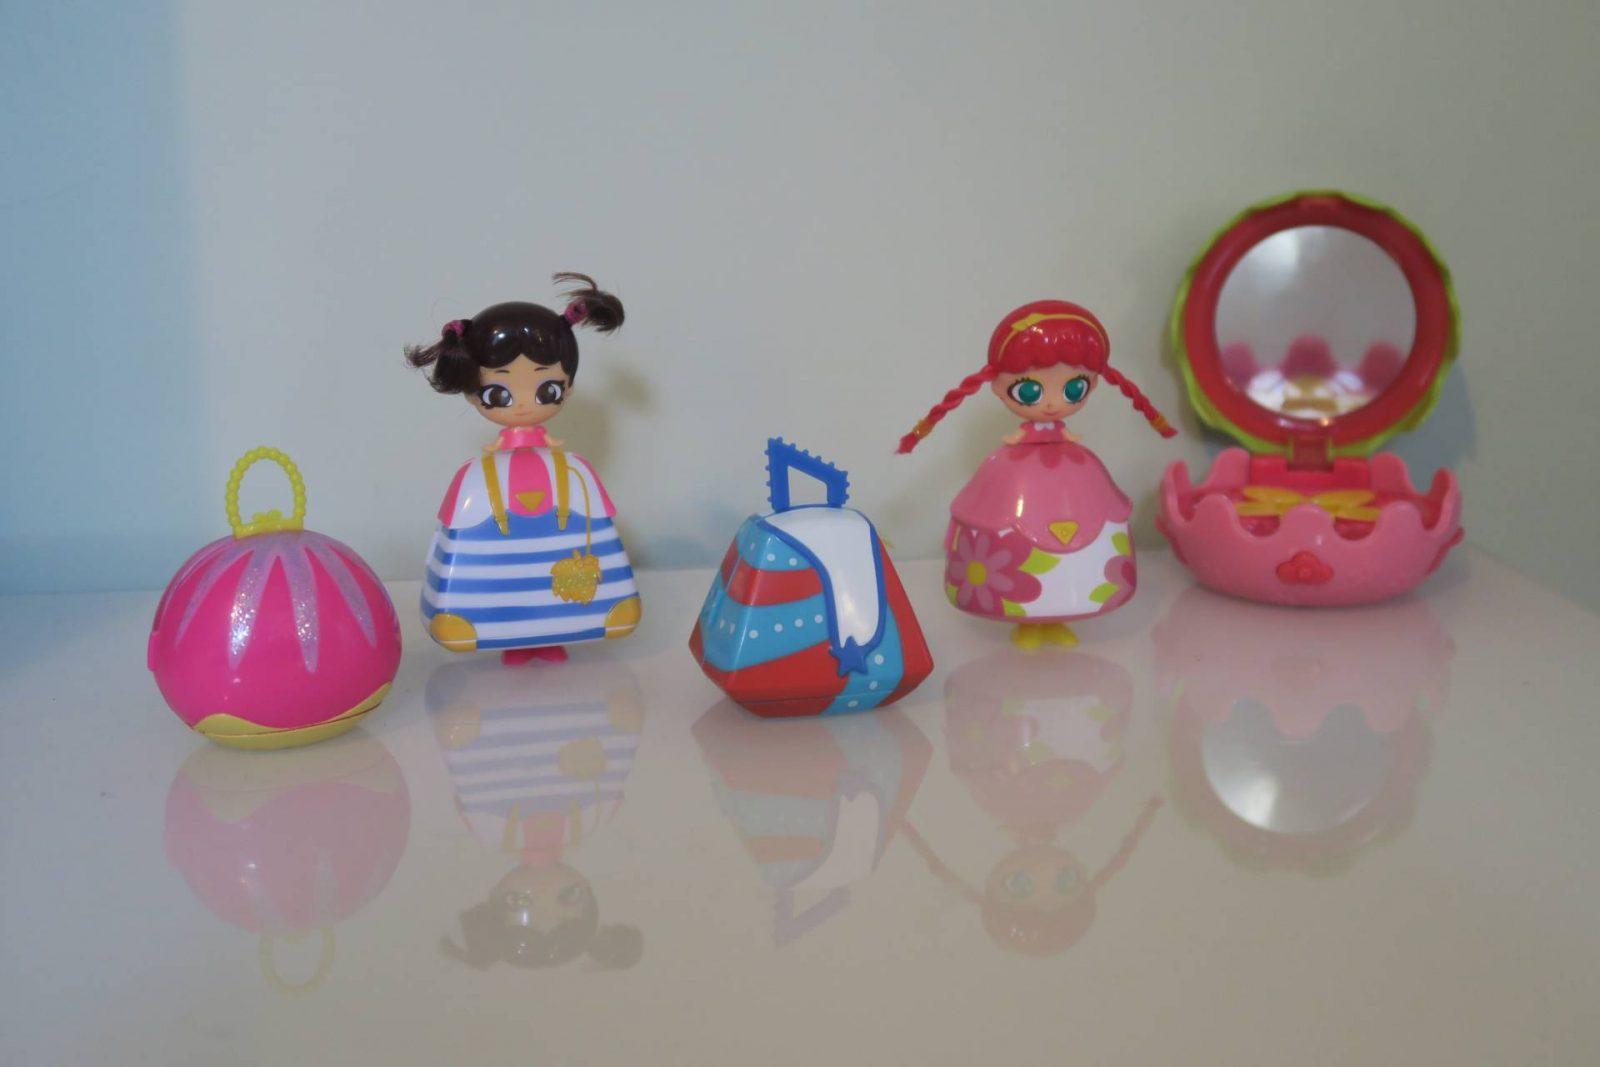 Kekilou Surprise Toys Review + Giveaway!